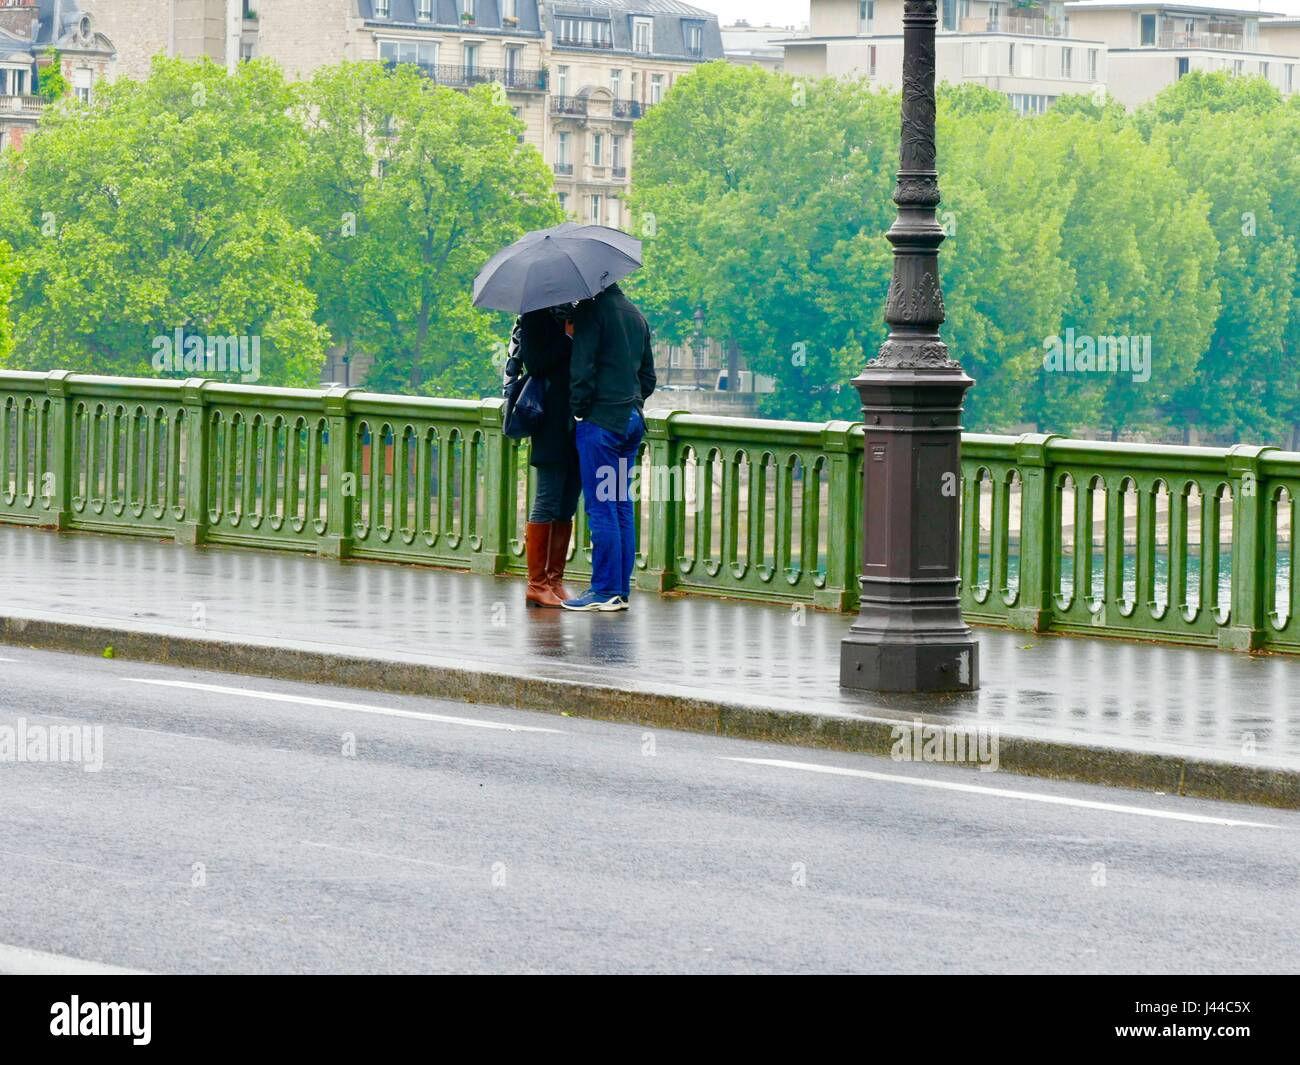 lovers-under-an-umbrella-on-a-bridge-ove